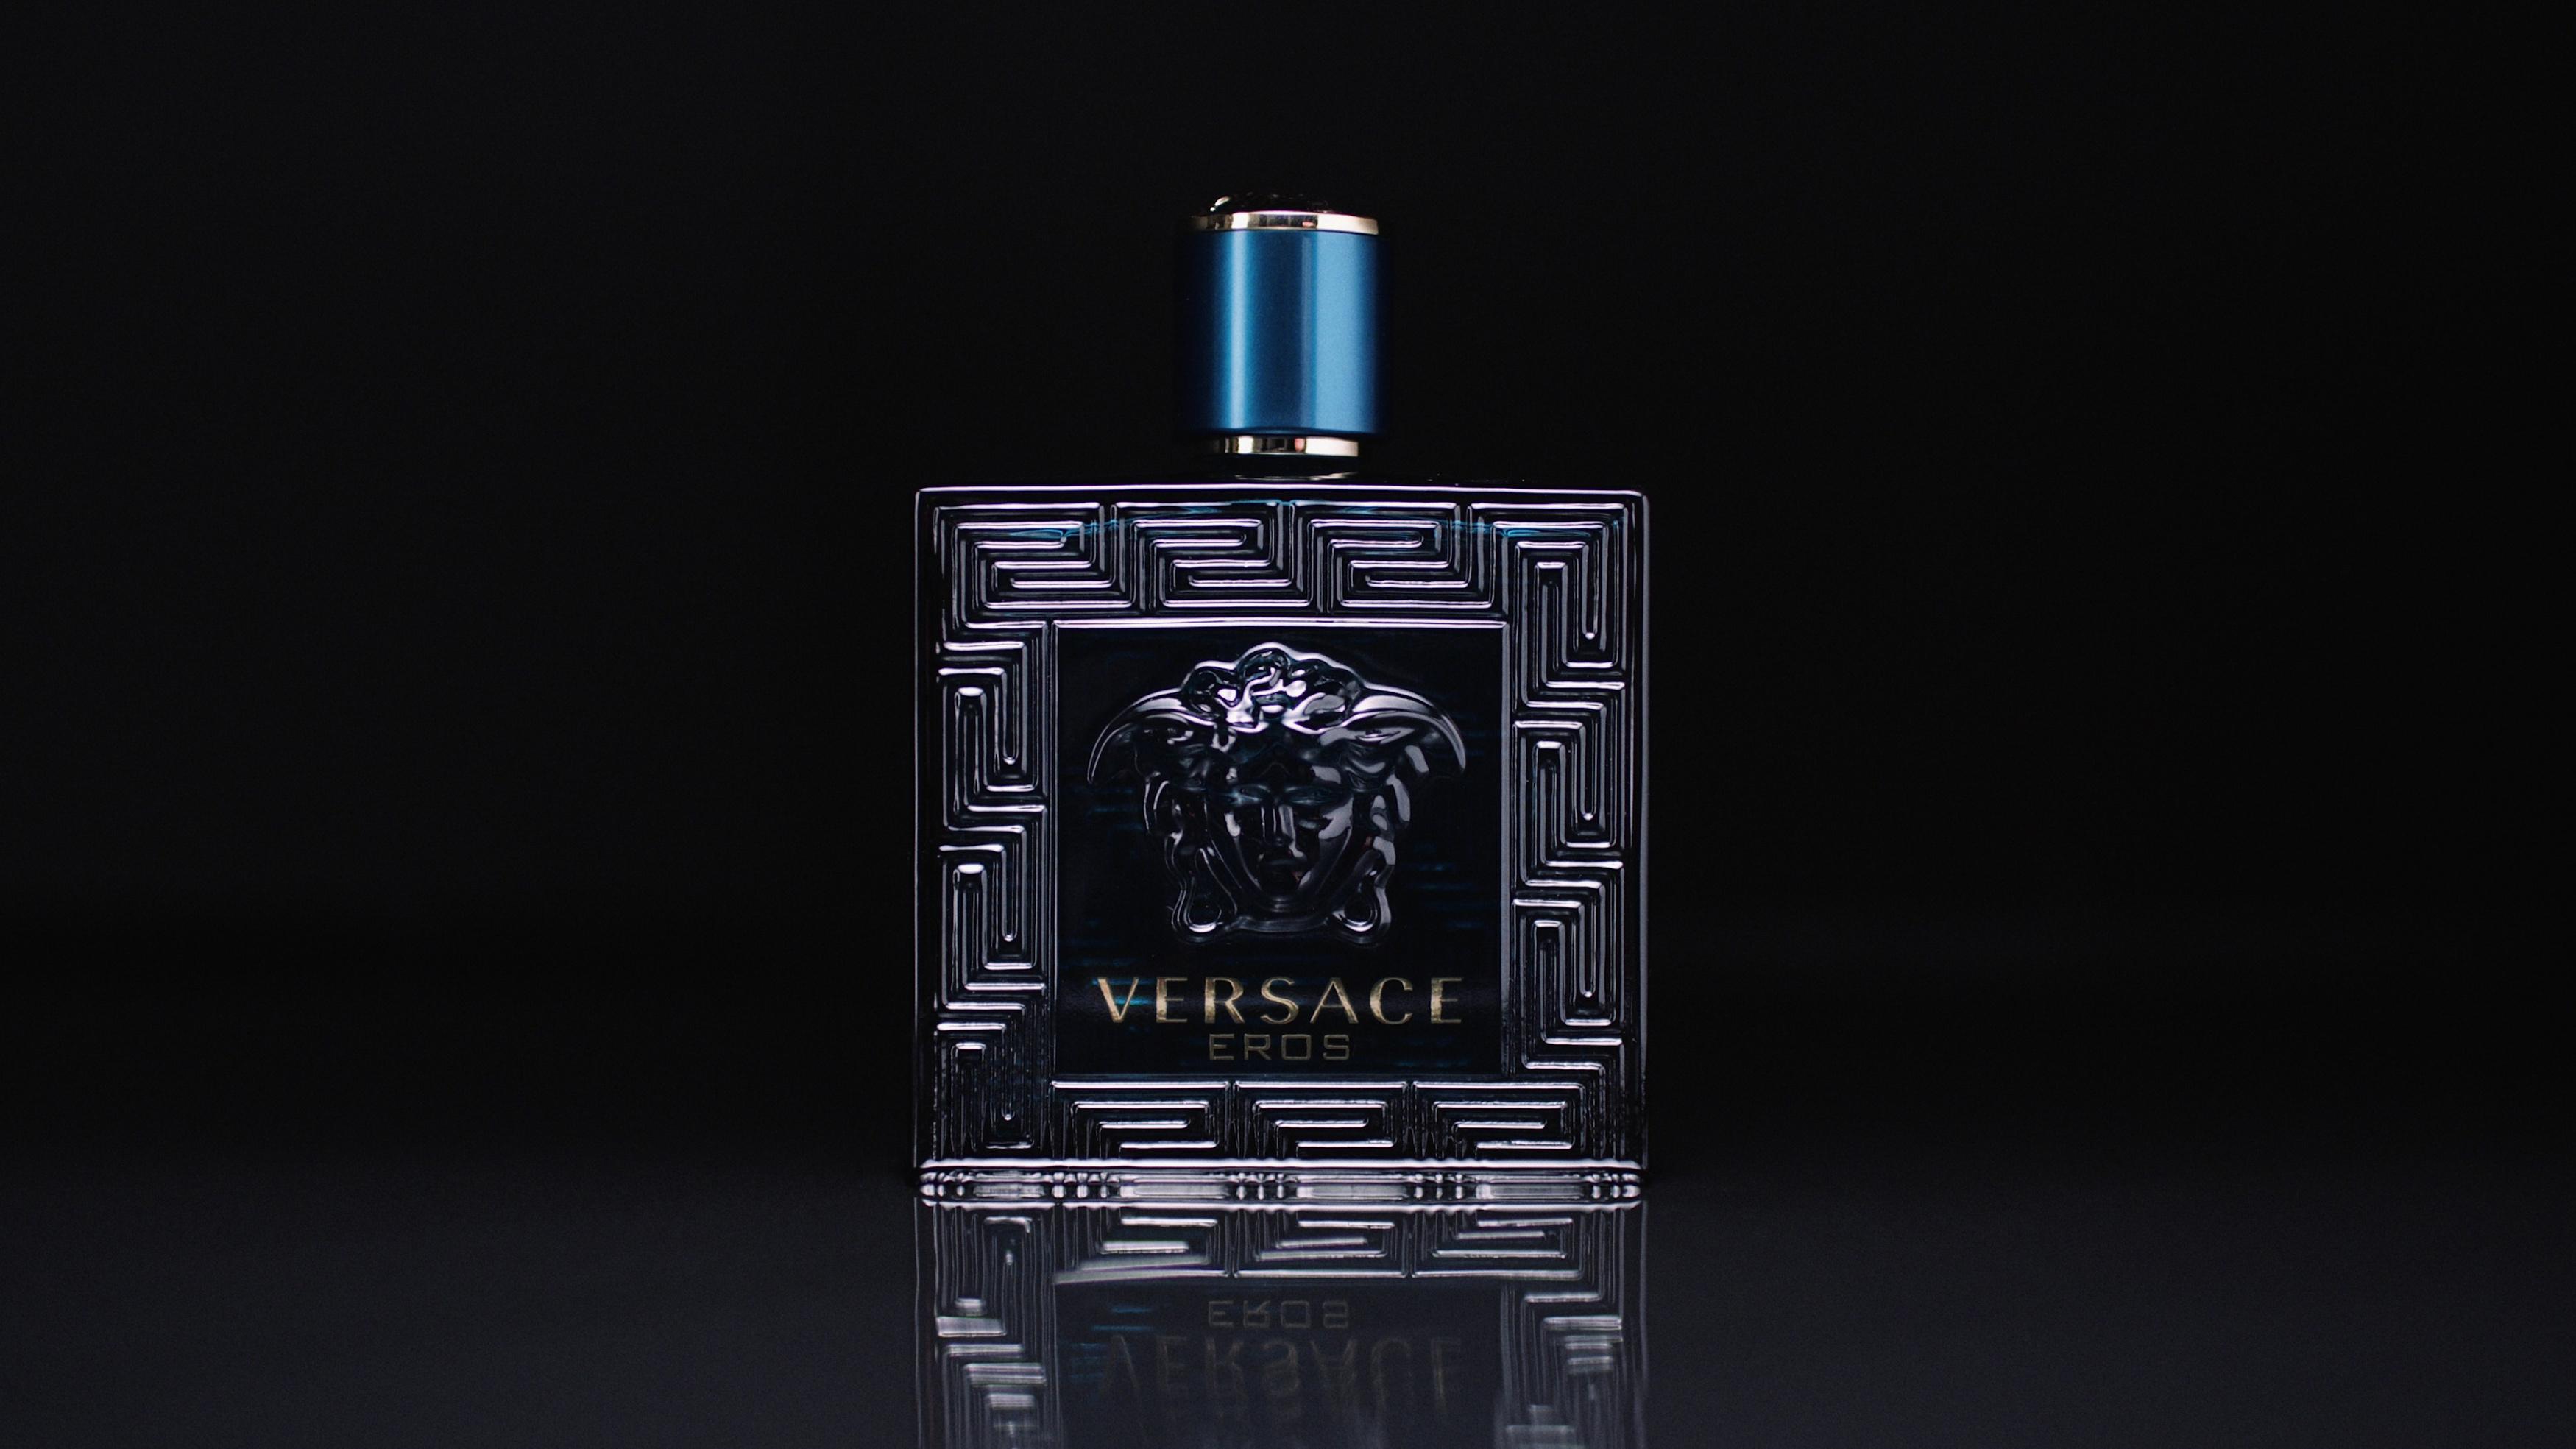 Versace Eros Harry Kemp